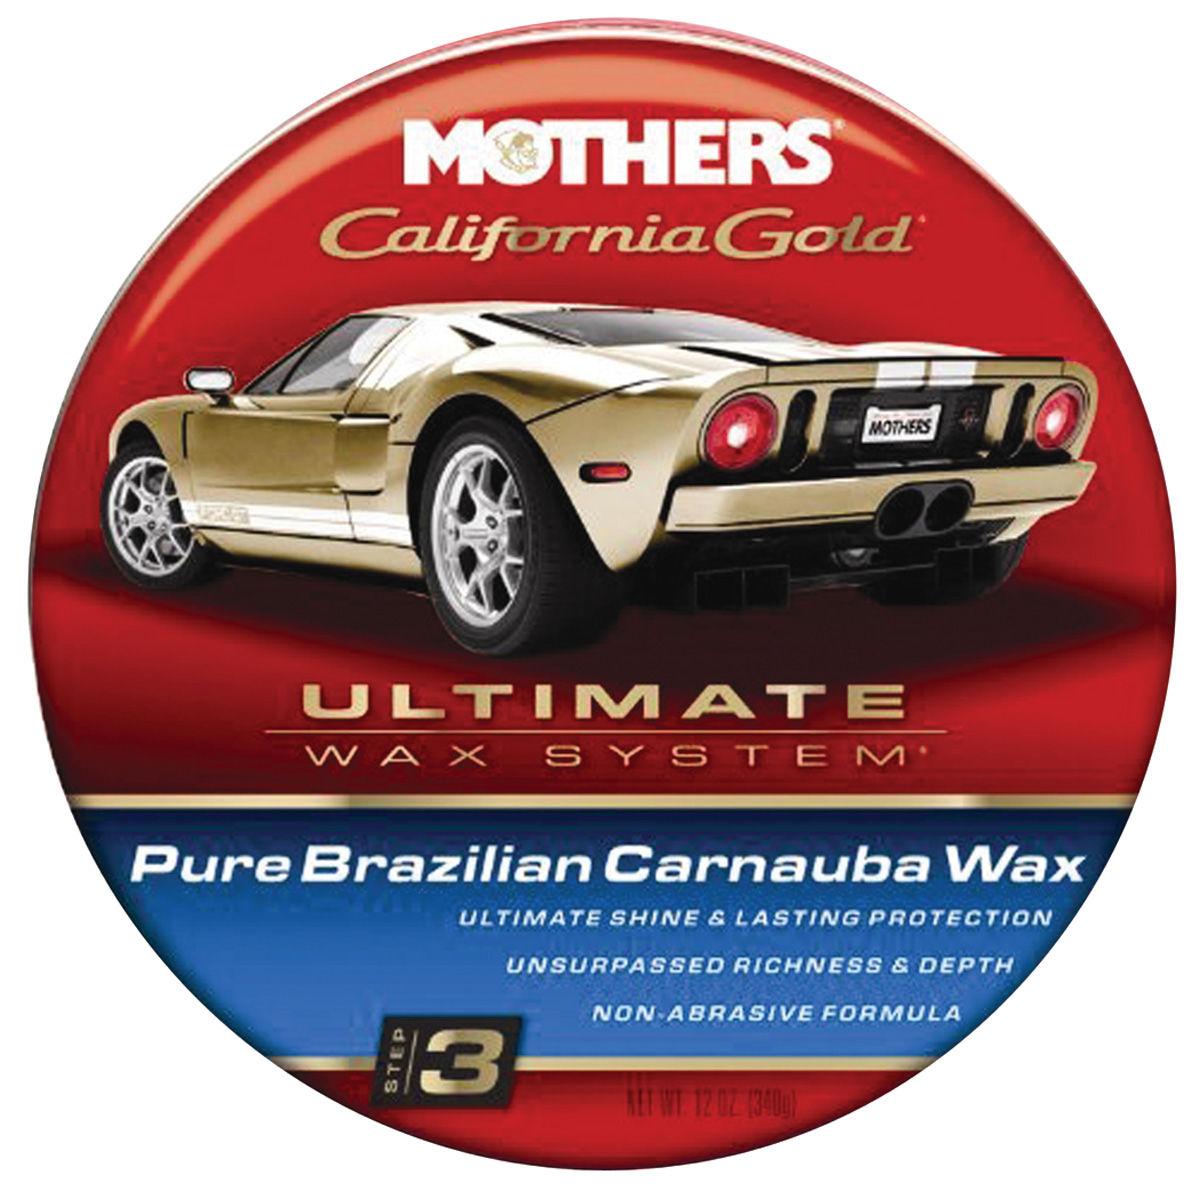 Pure Brazilian Carnauba Wax, Mothers California Gold, 12-oz. paste